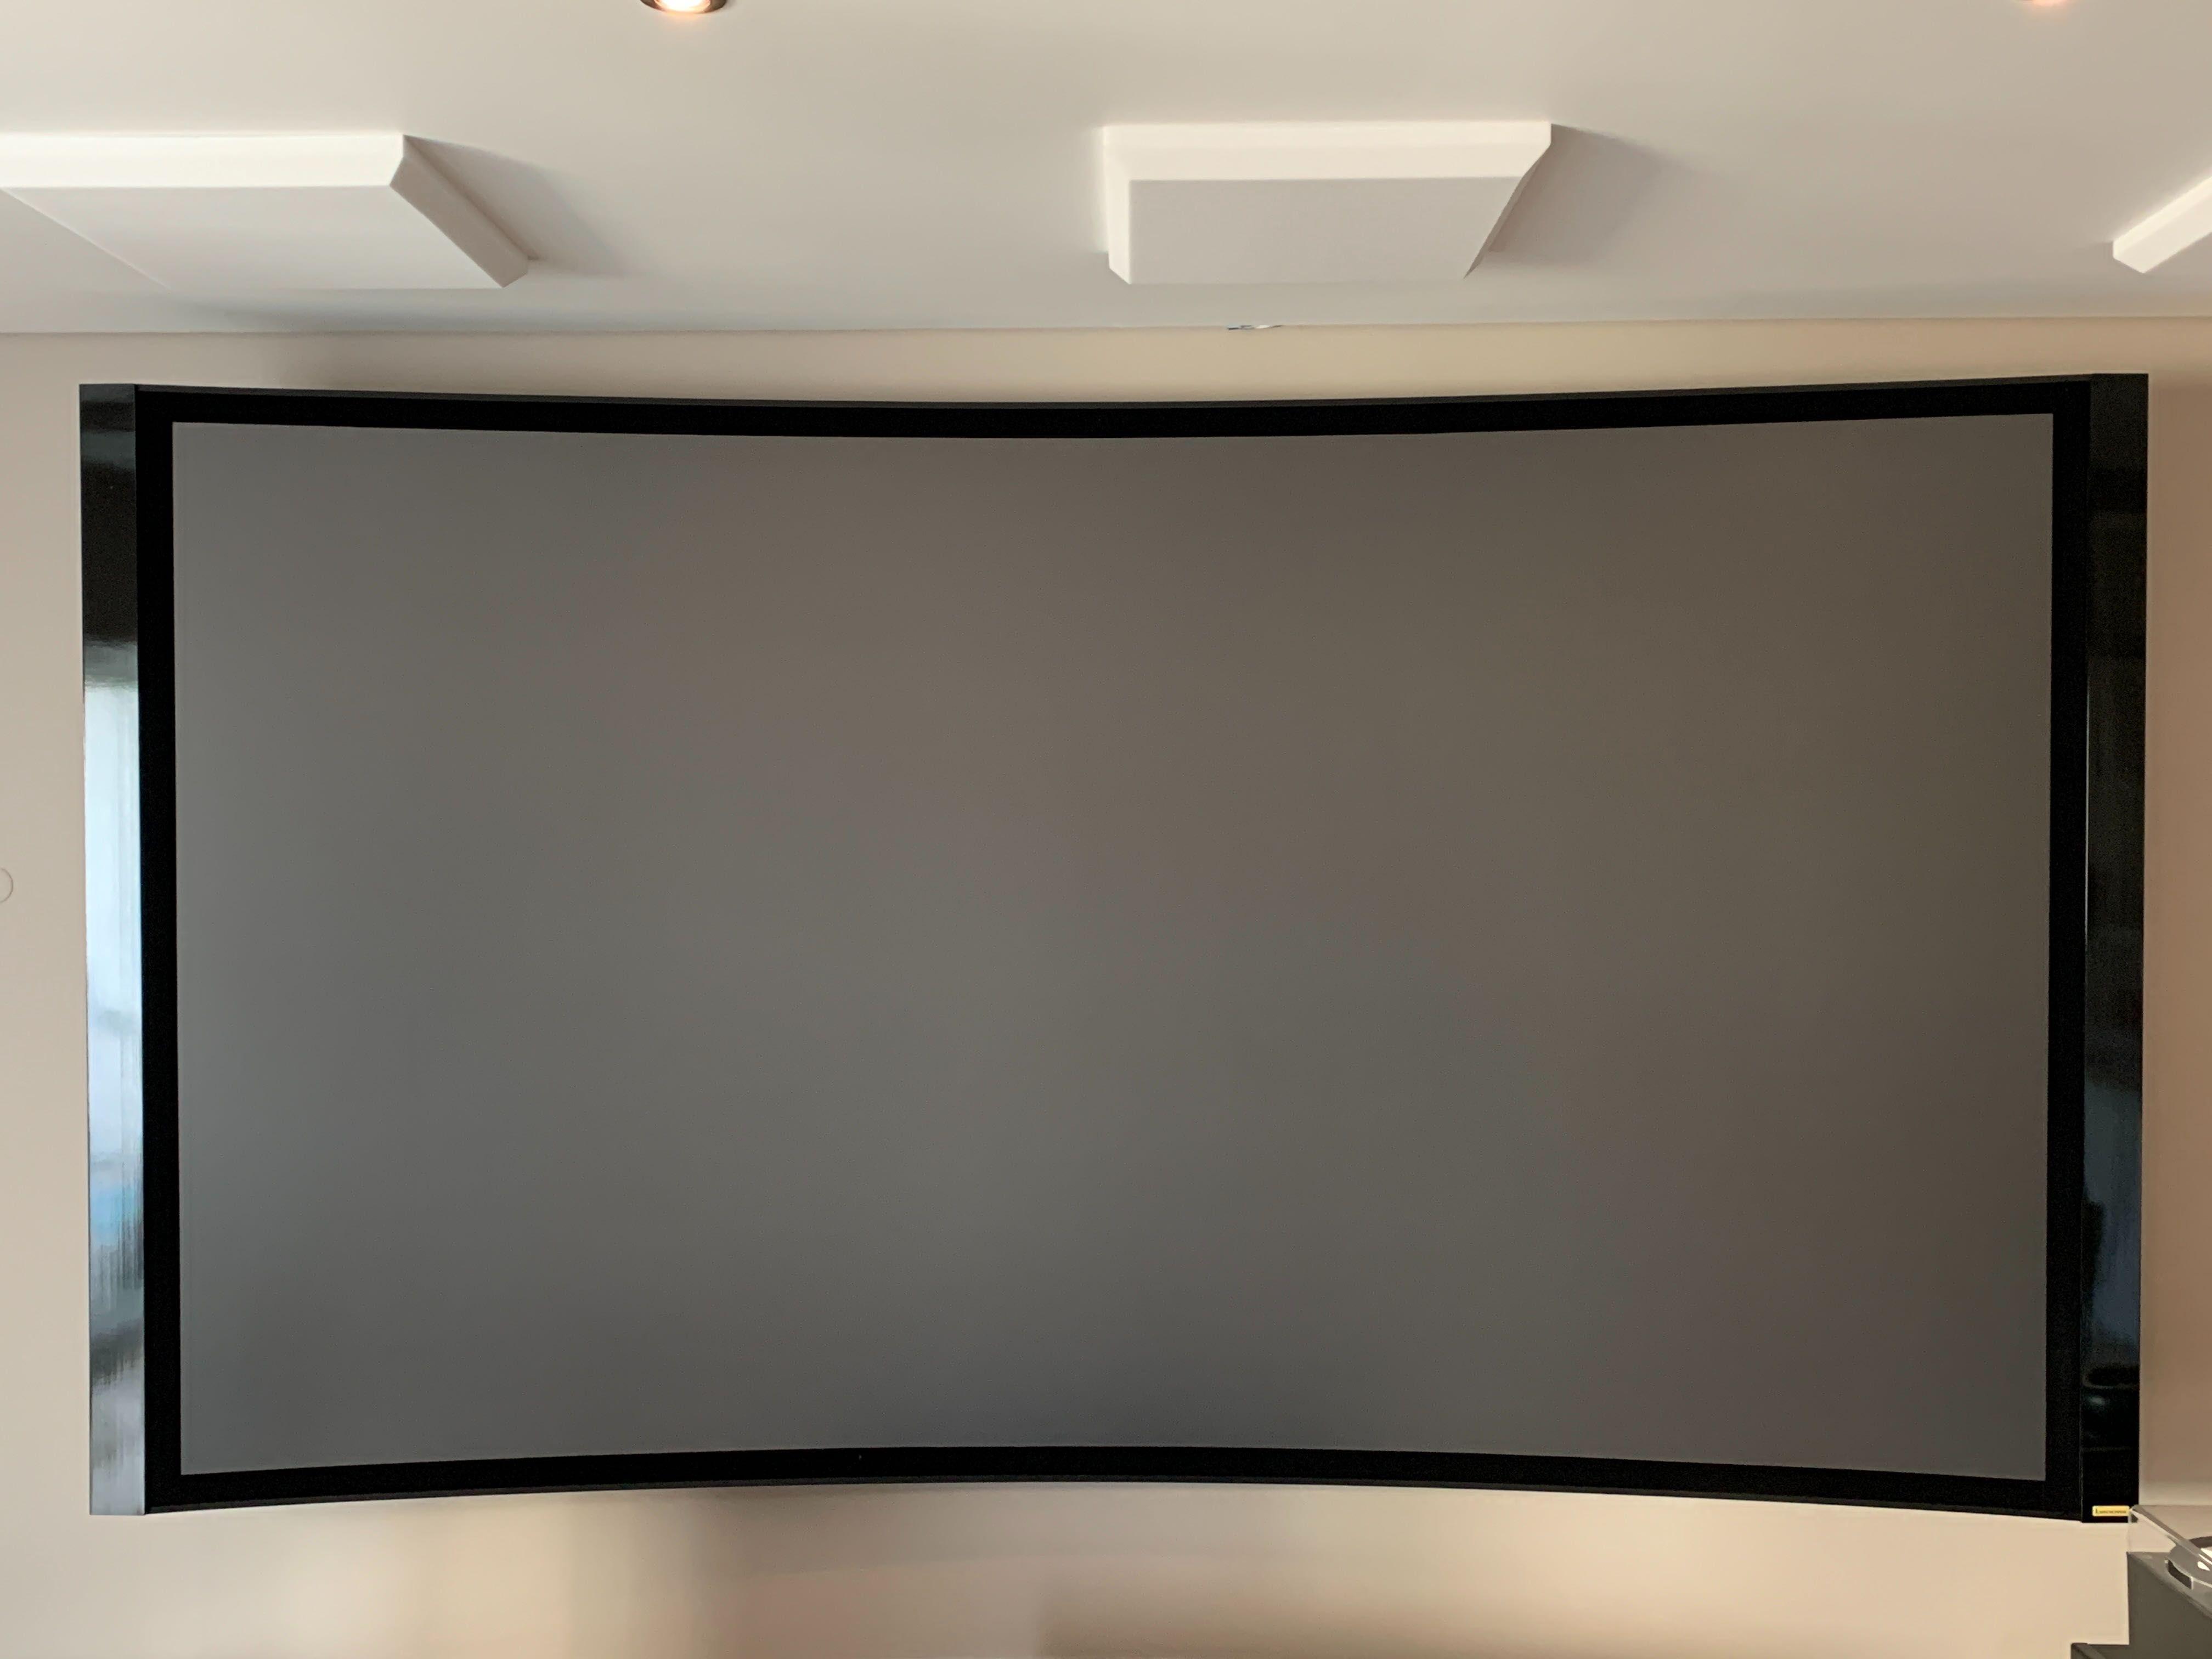 "Tela técnica para projetor 120"" Lusoscreen Darkstar"